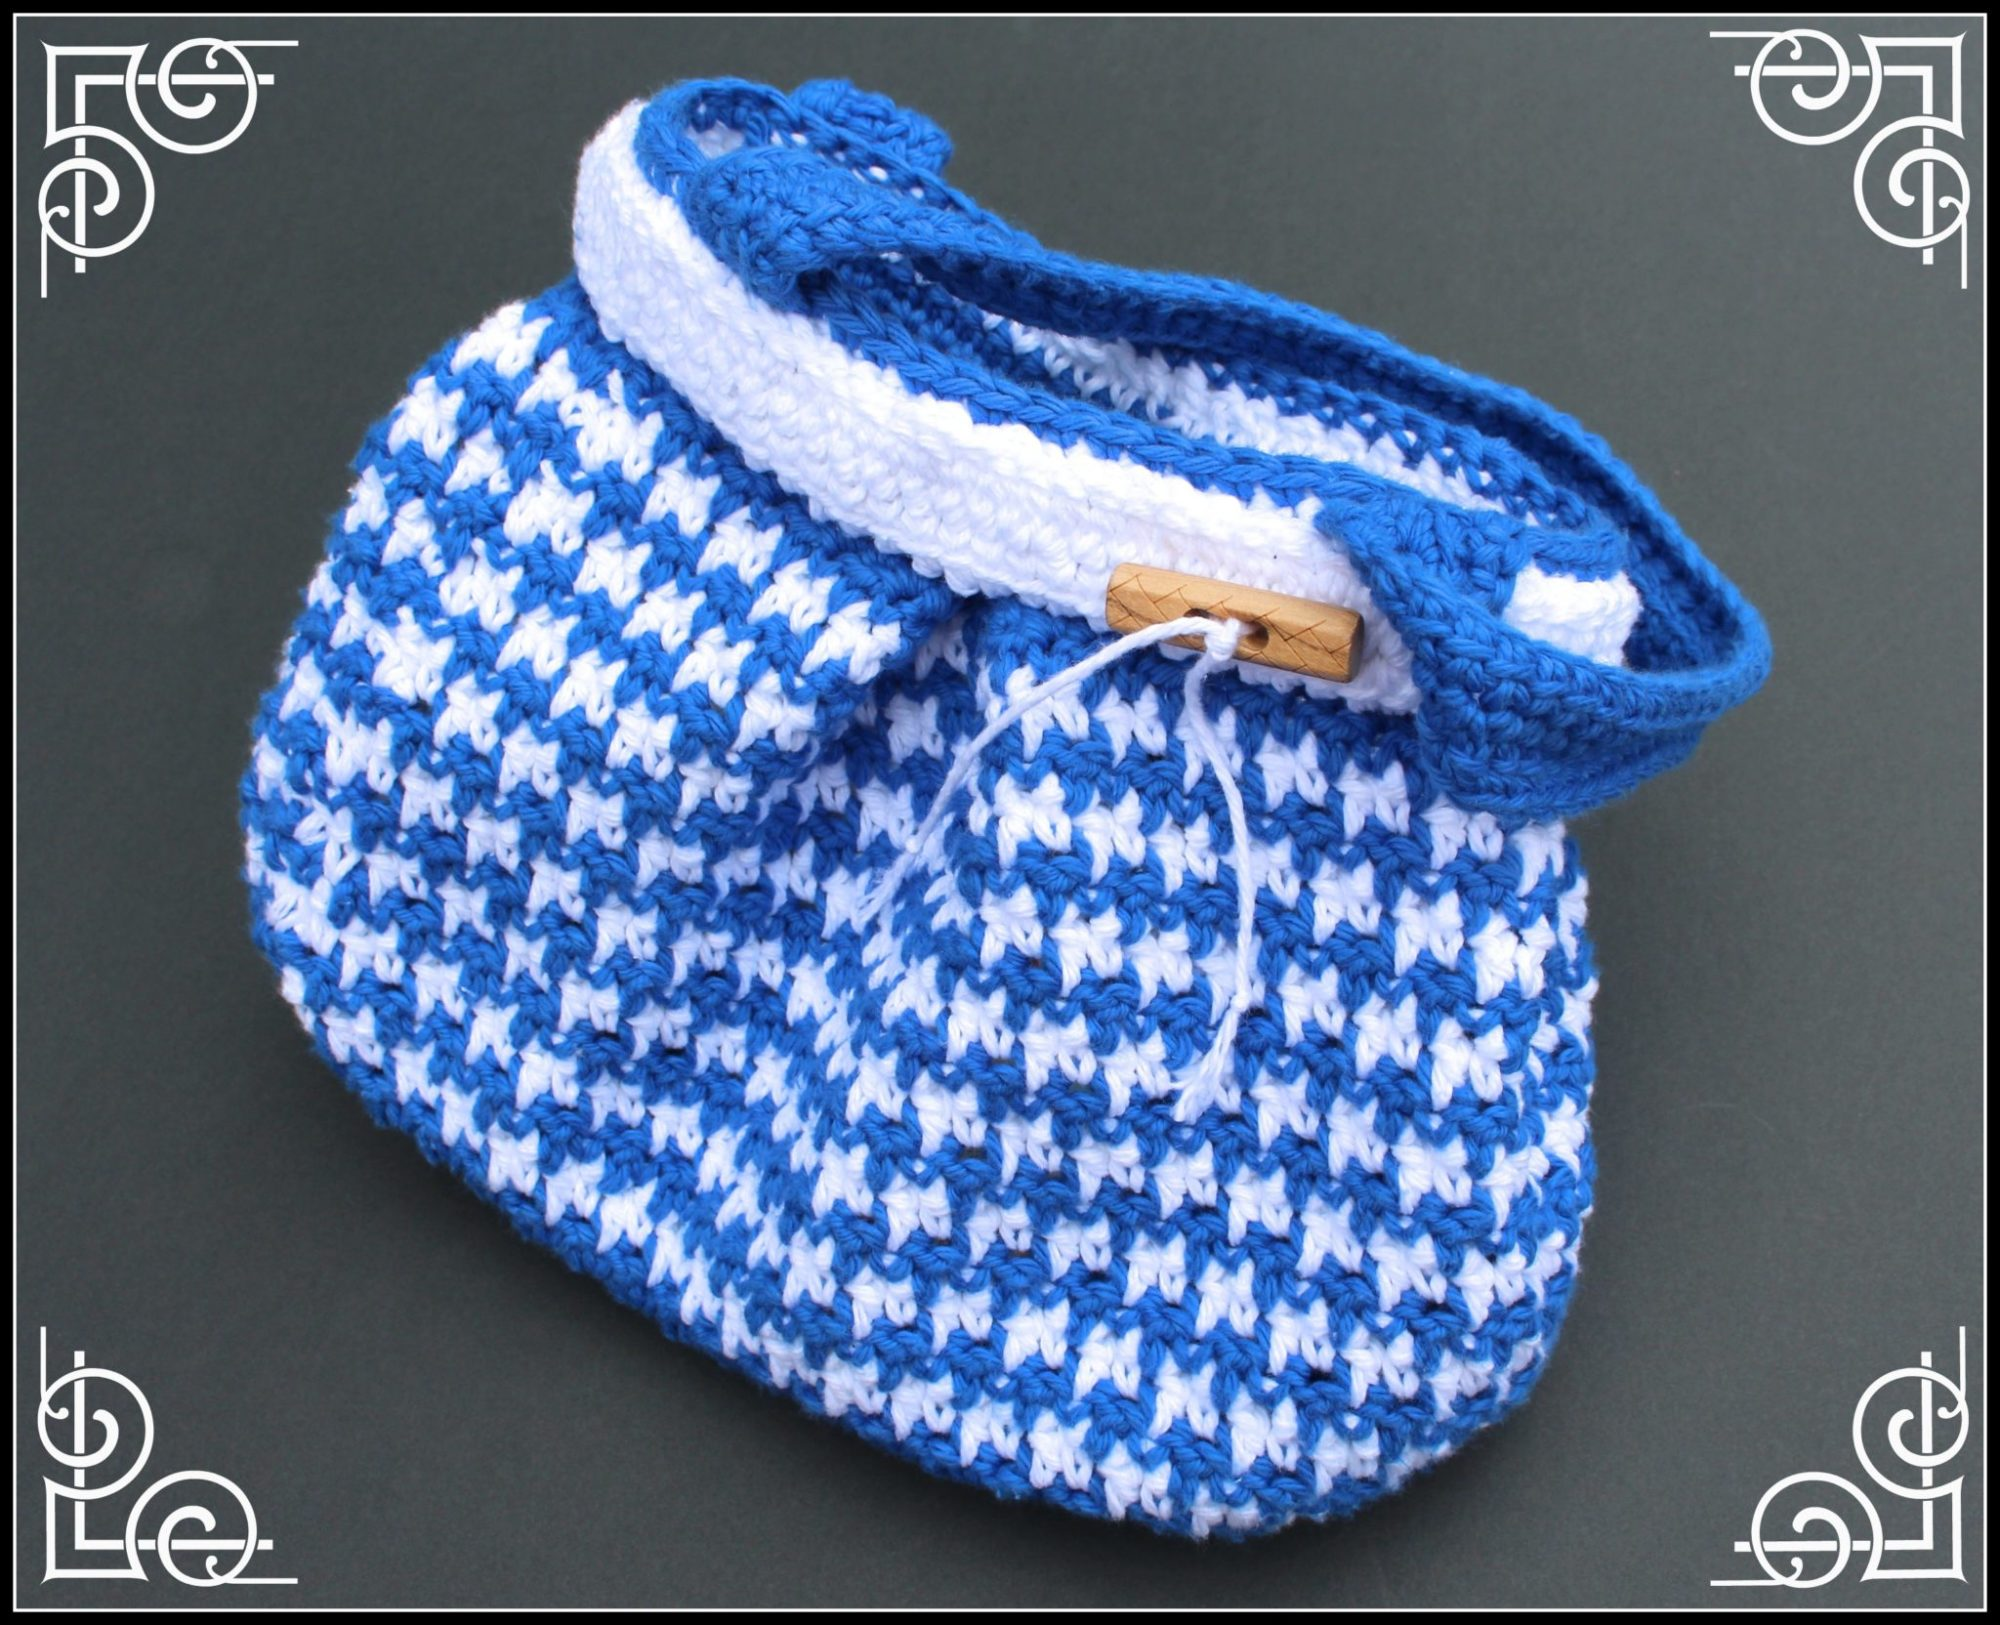 brtthday bag IMG_0952.jpg